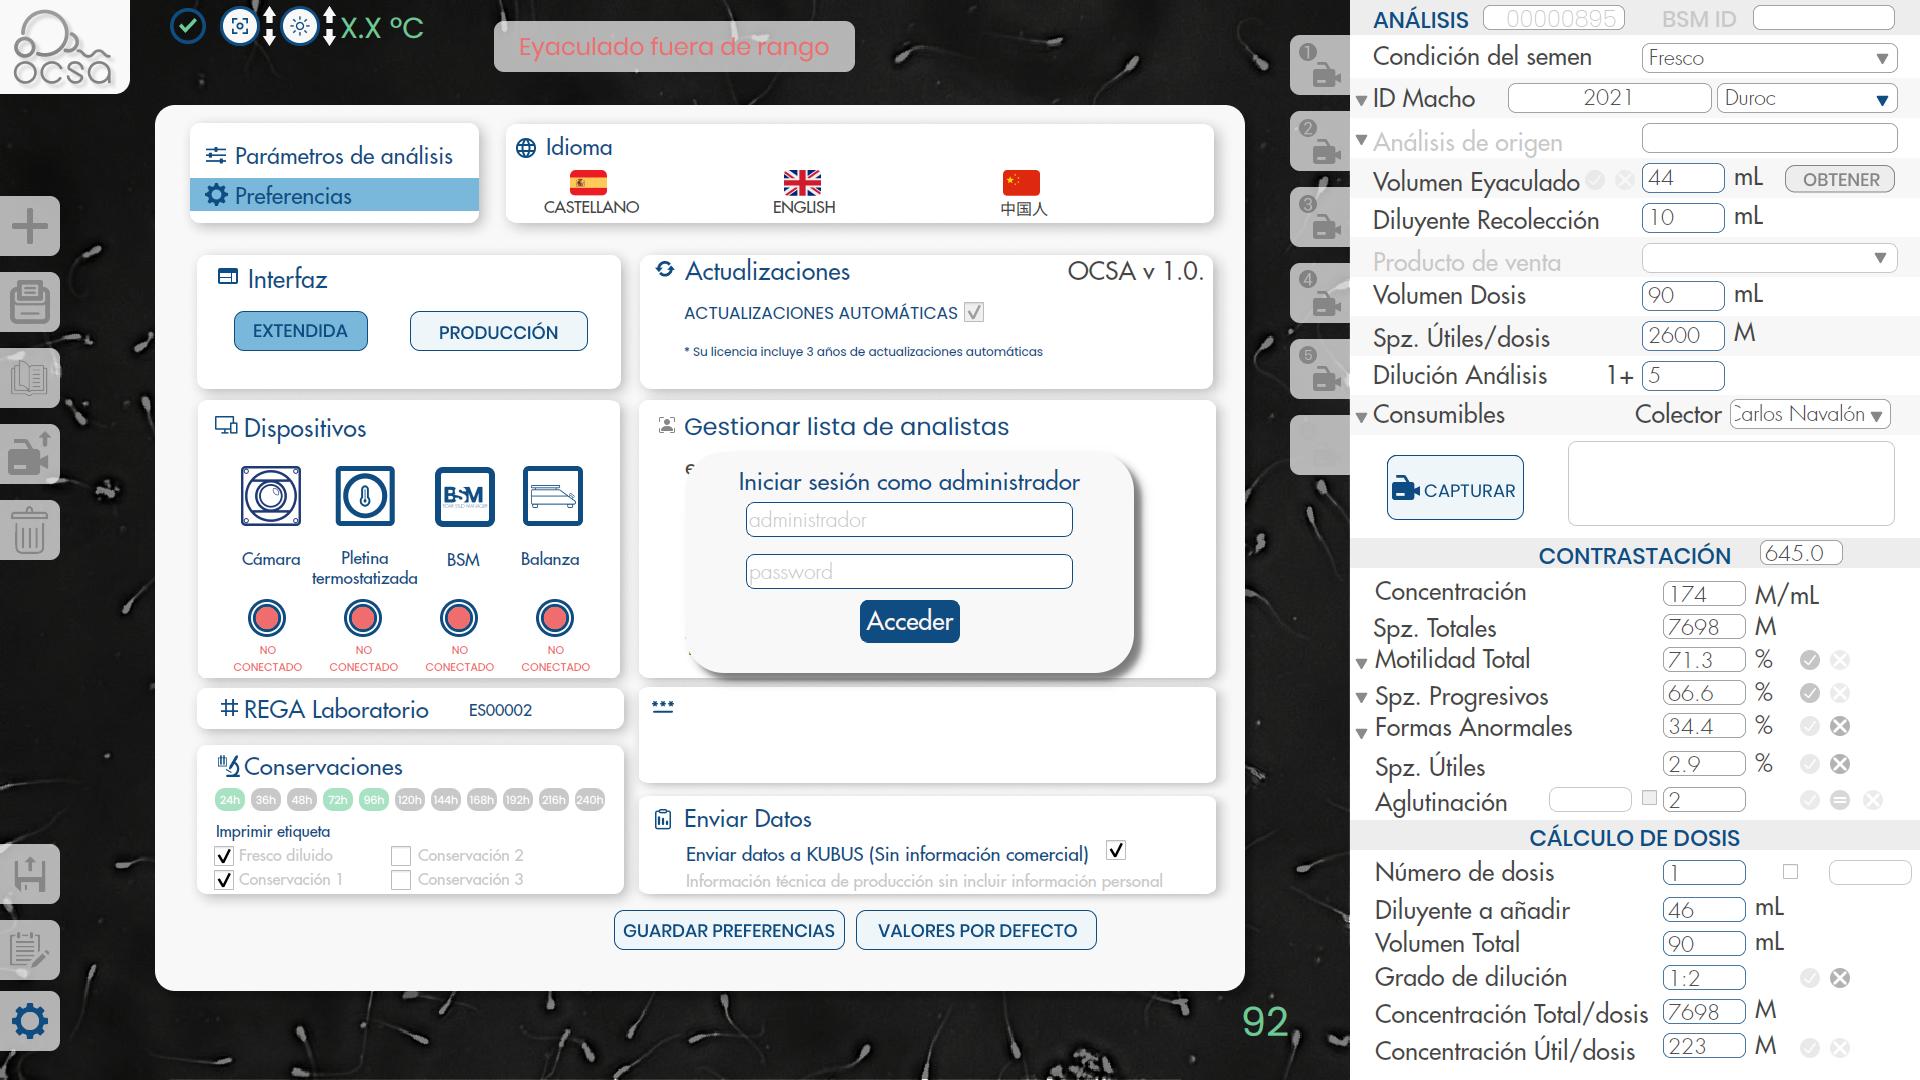 main_screen_config2